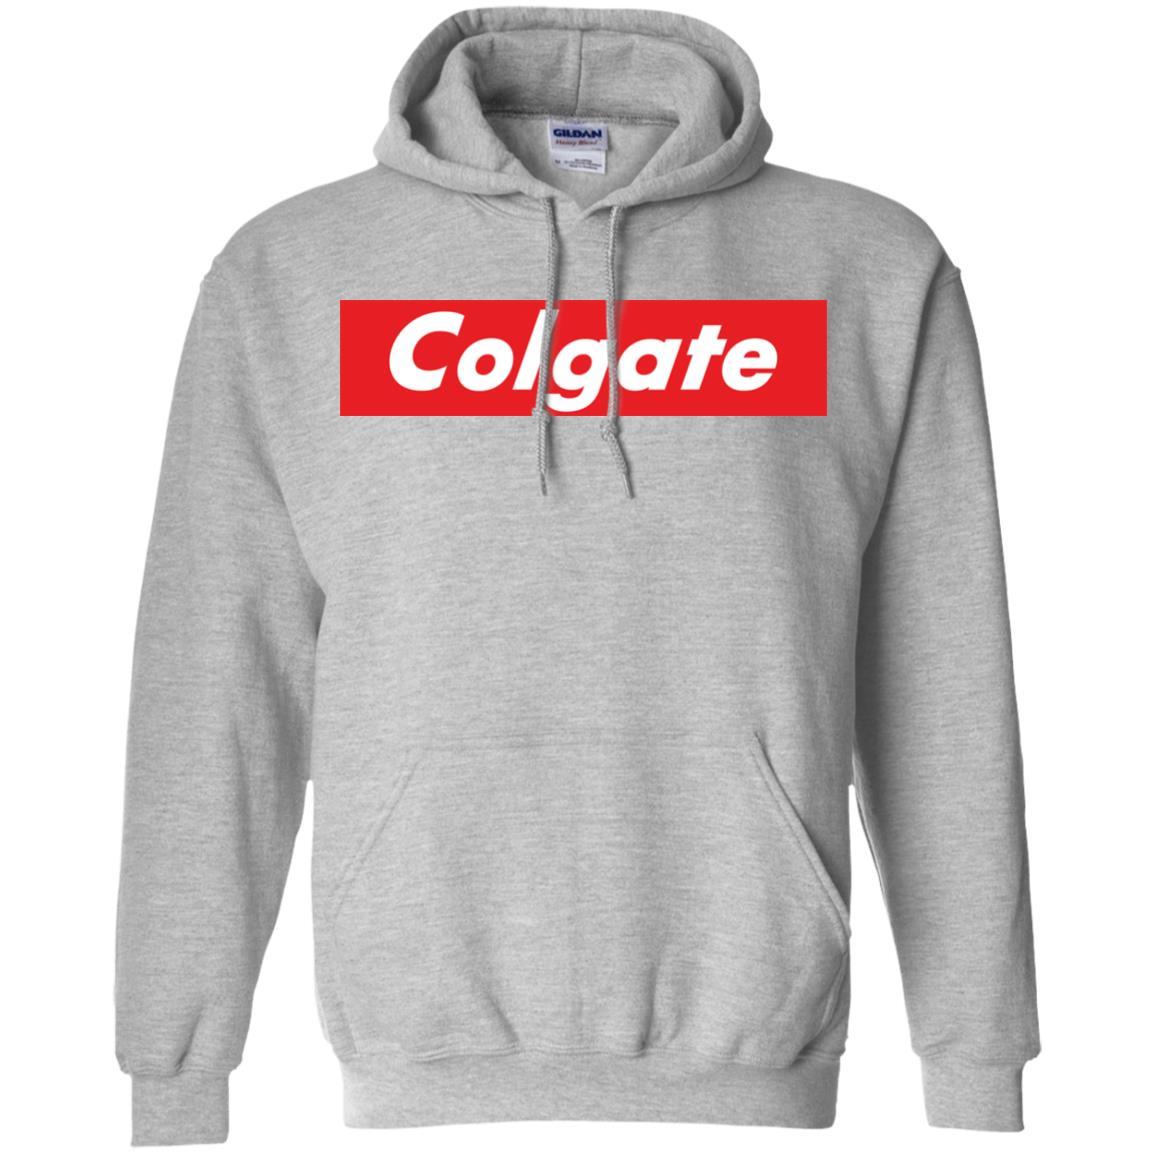 image 991px Supreme Colgate Shirt, Hoodies, Tank